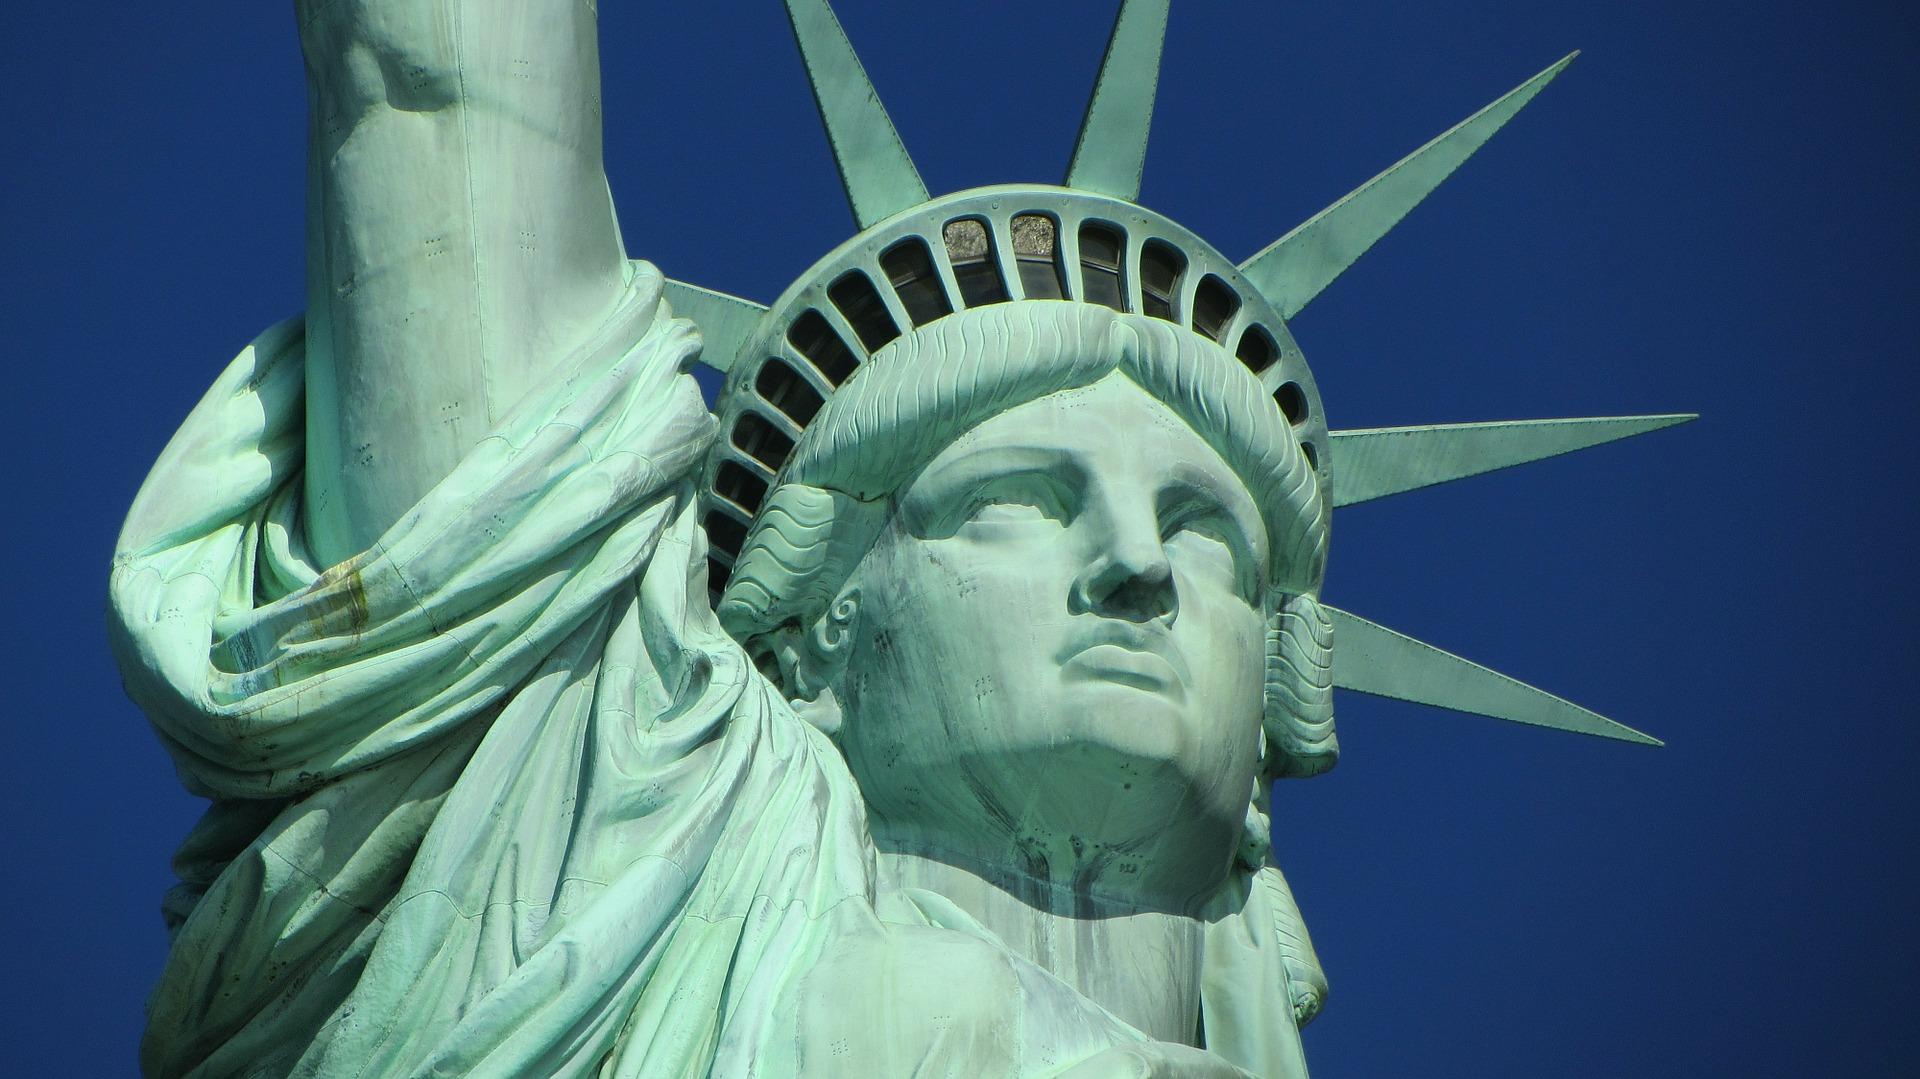 Estatua de la Libertad - NoticiasYa